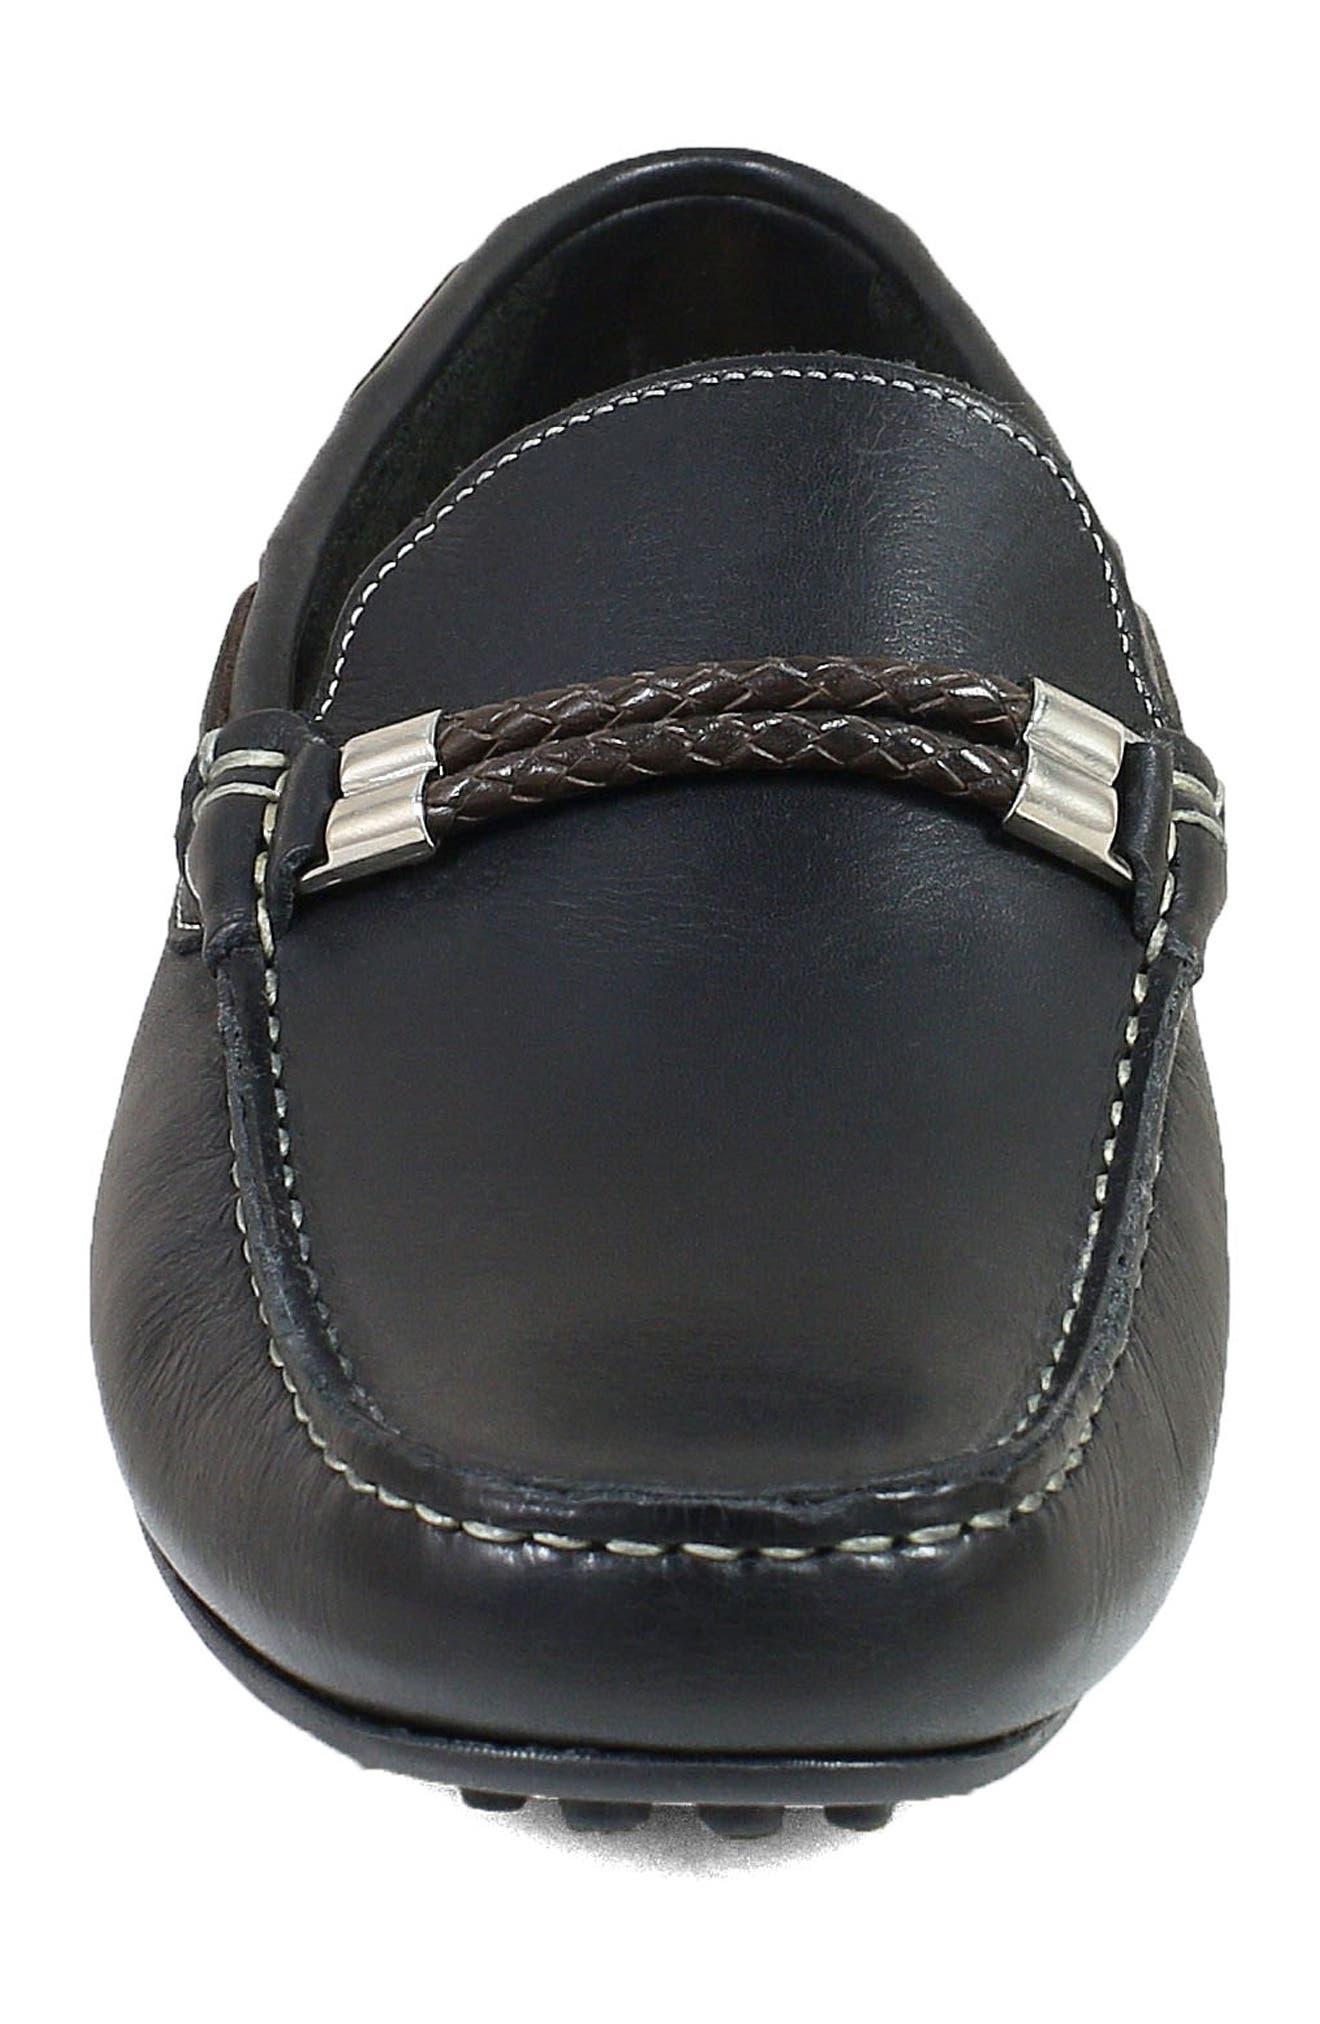 FLORSHEIM,                             Imperial Comet Driving Shoe,                             Alternate thumbnail 4, color,                             BLACK LEATHER